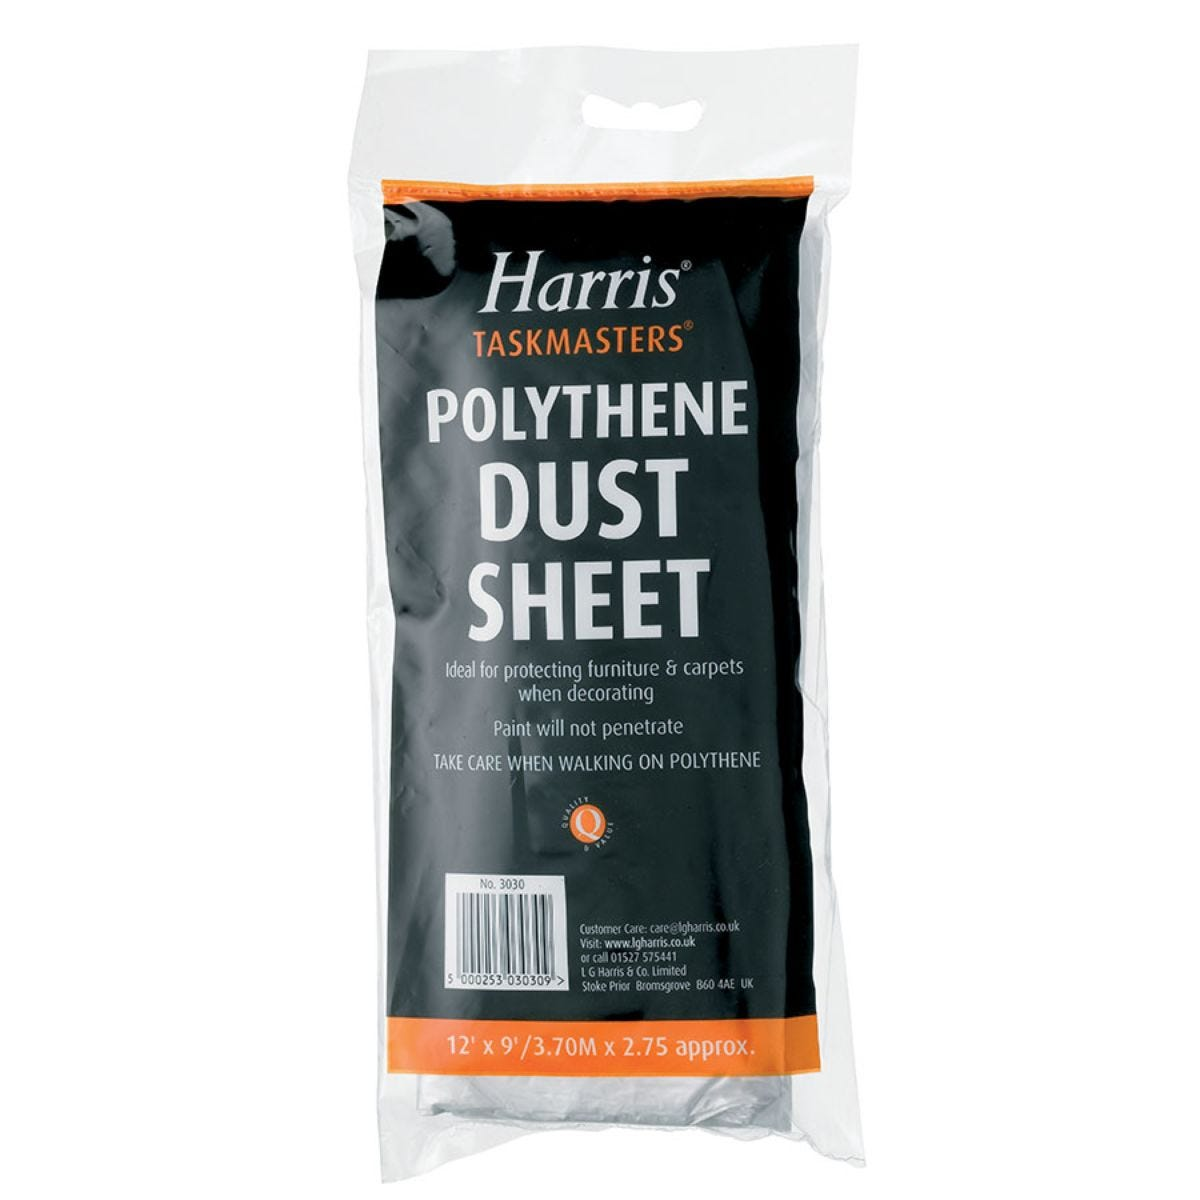 Harris Taskmasters Polythene Dust Sheet